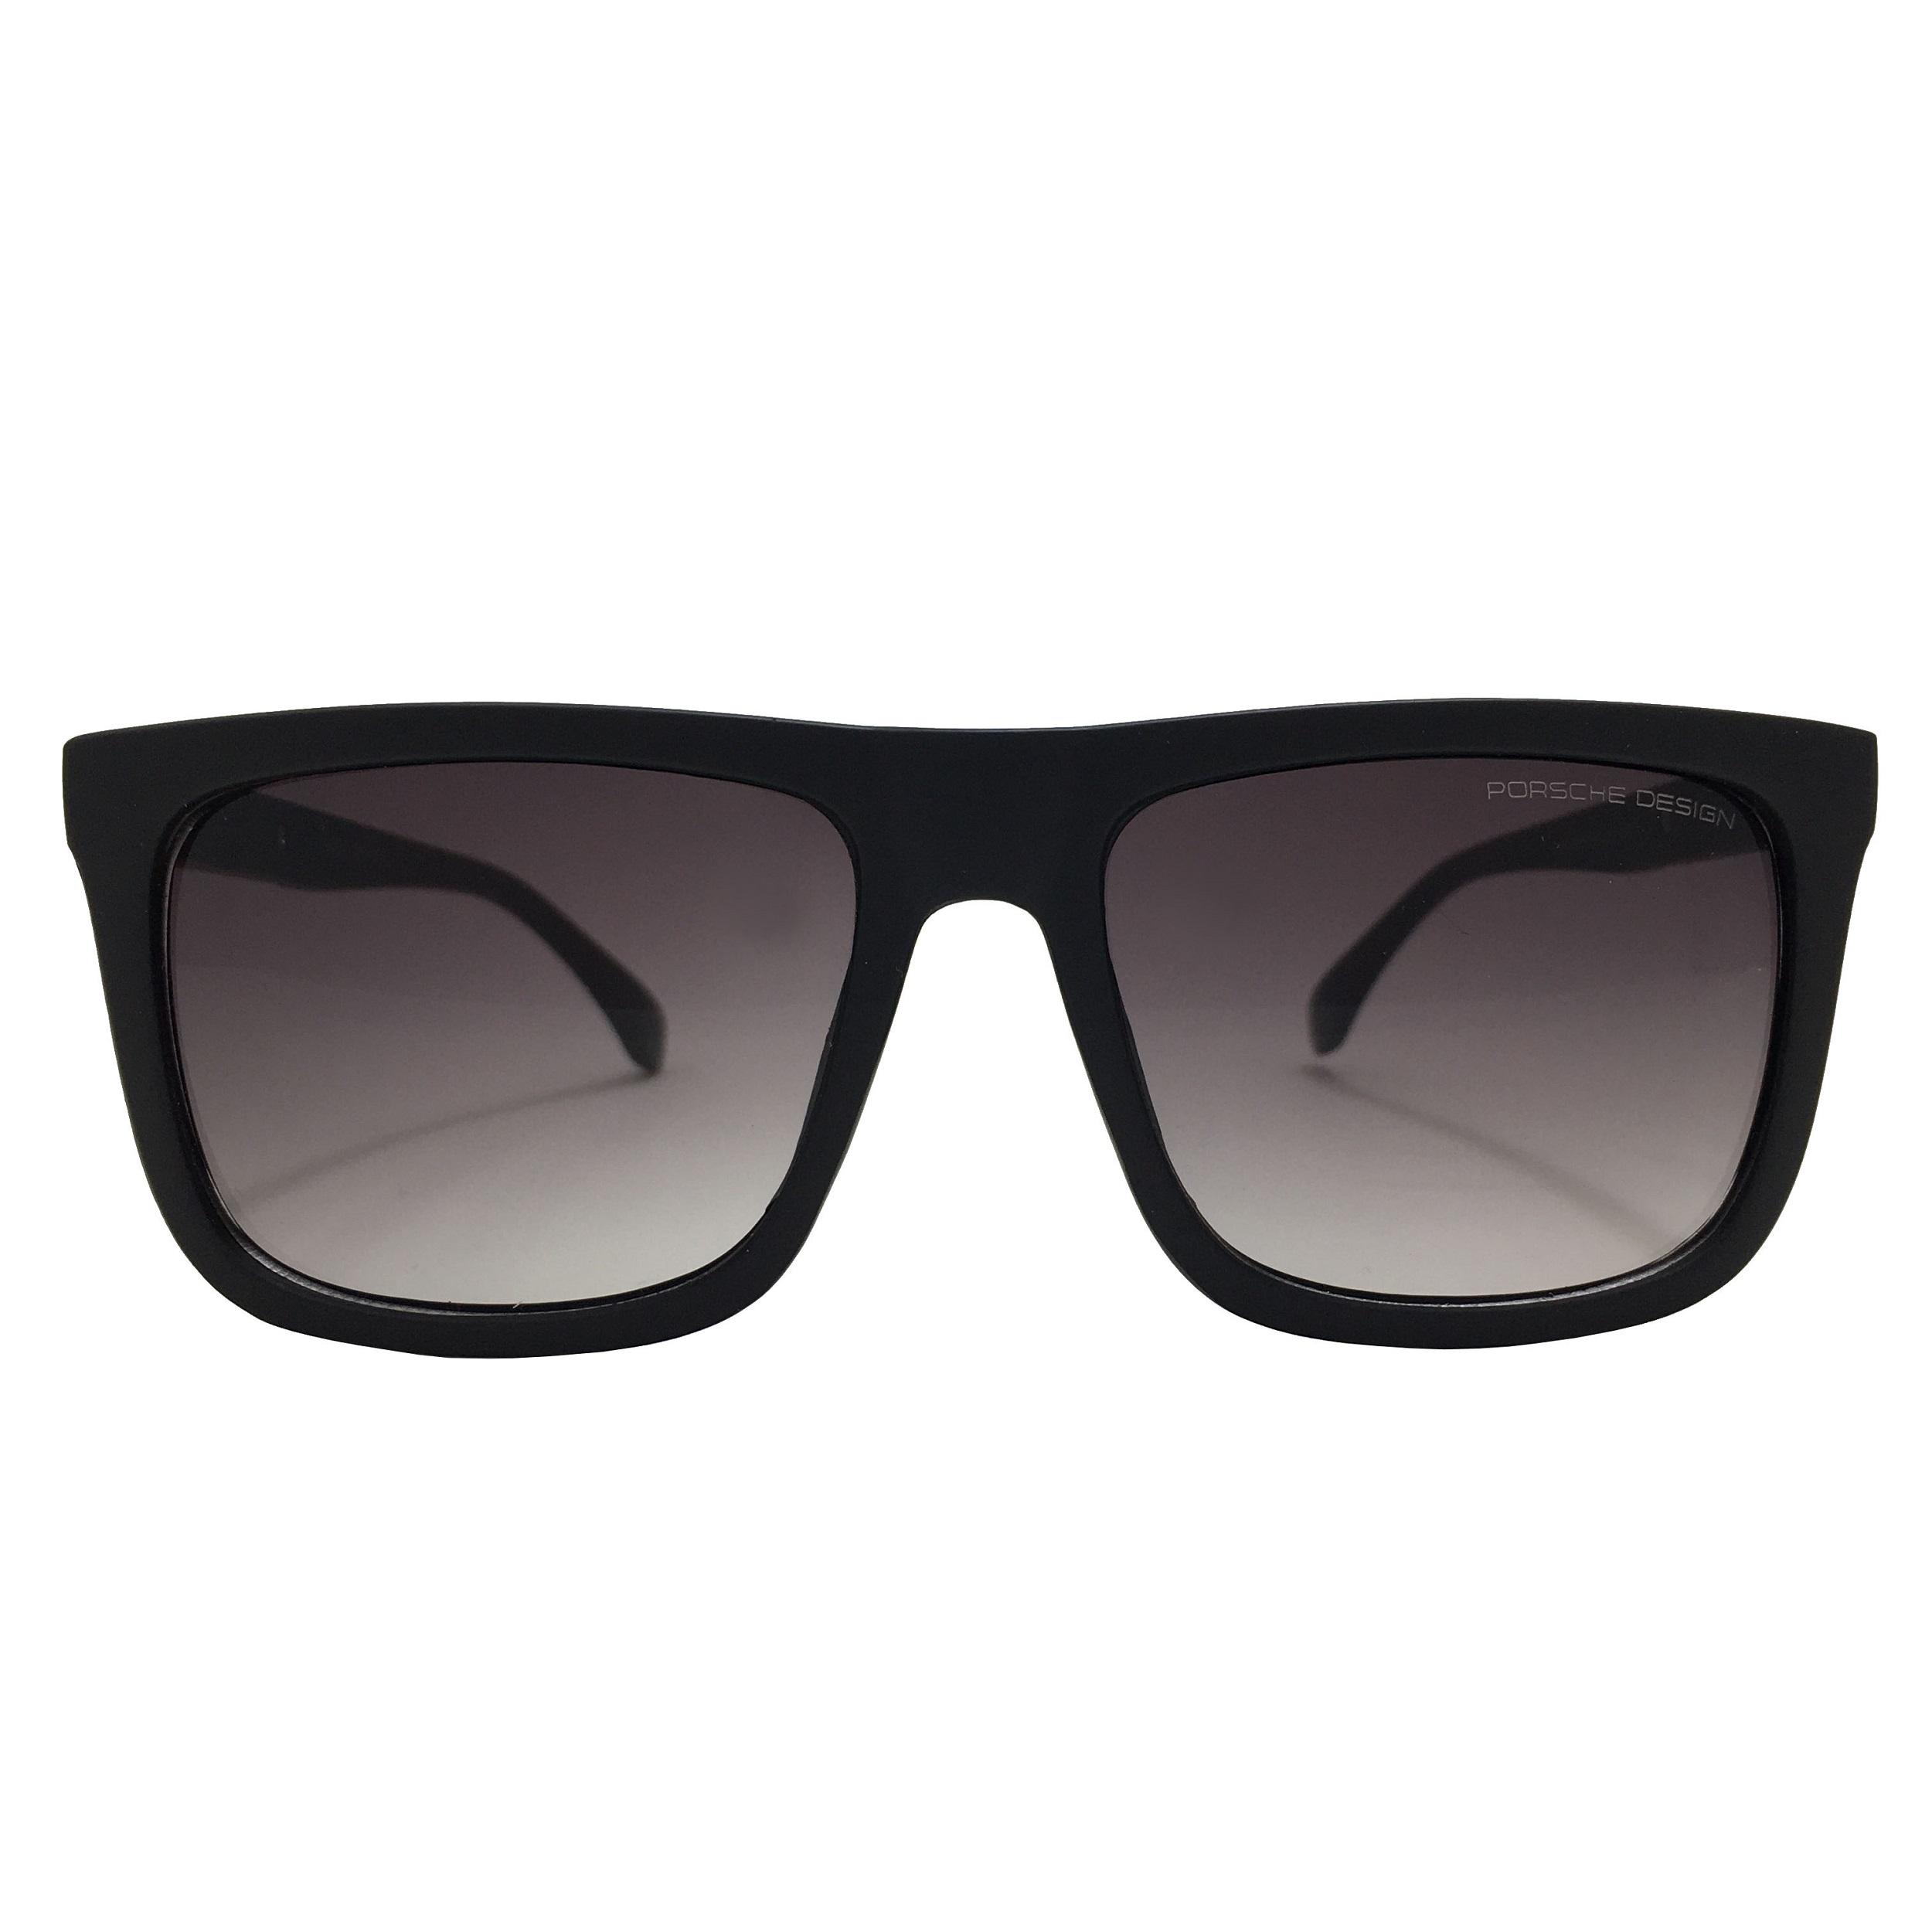 عینک آفتابی  مدل 9911                     غیر اصل